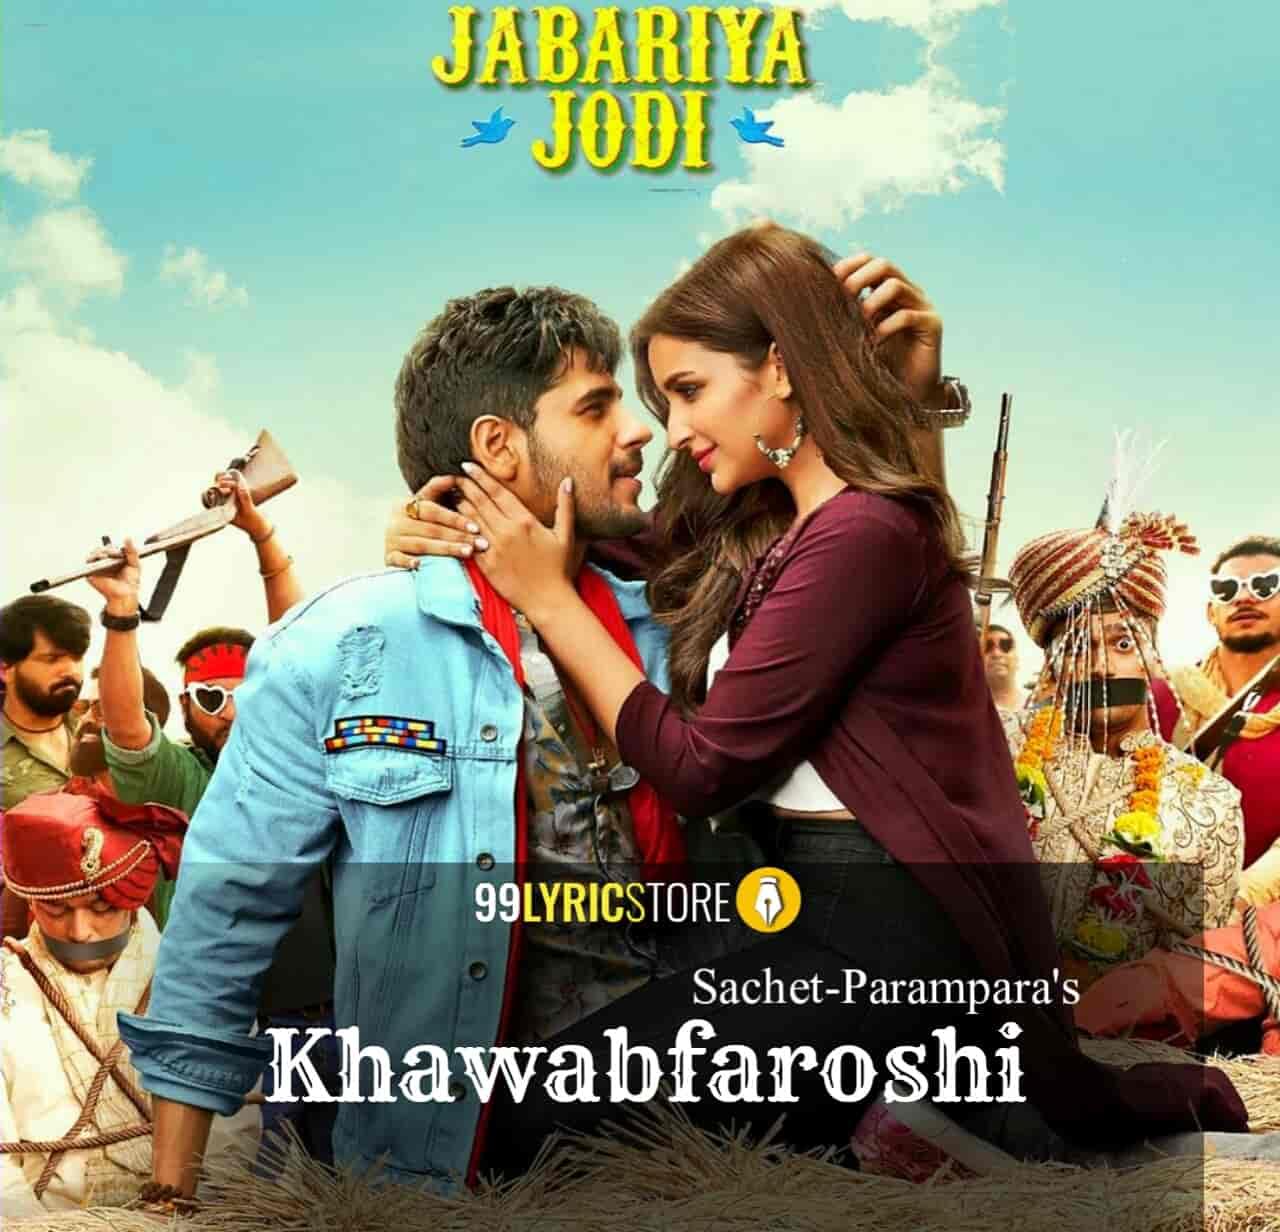 Khawabfaroshi Hindi song lyrics sung by sachet Tondon and Parampara Thakur from movie Jabariya Jodi